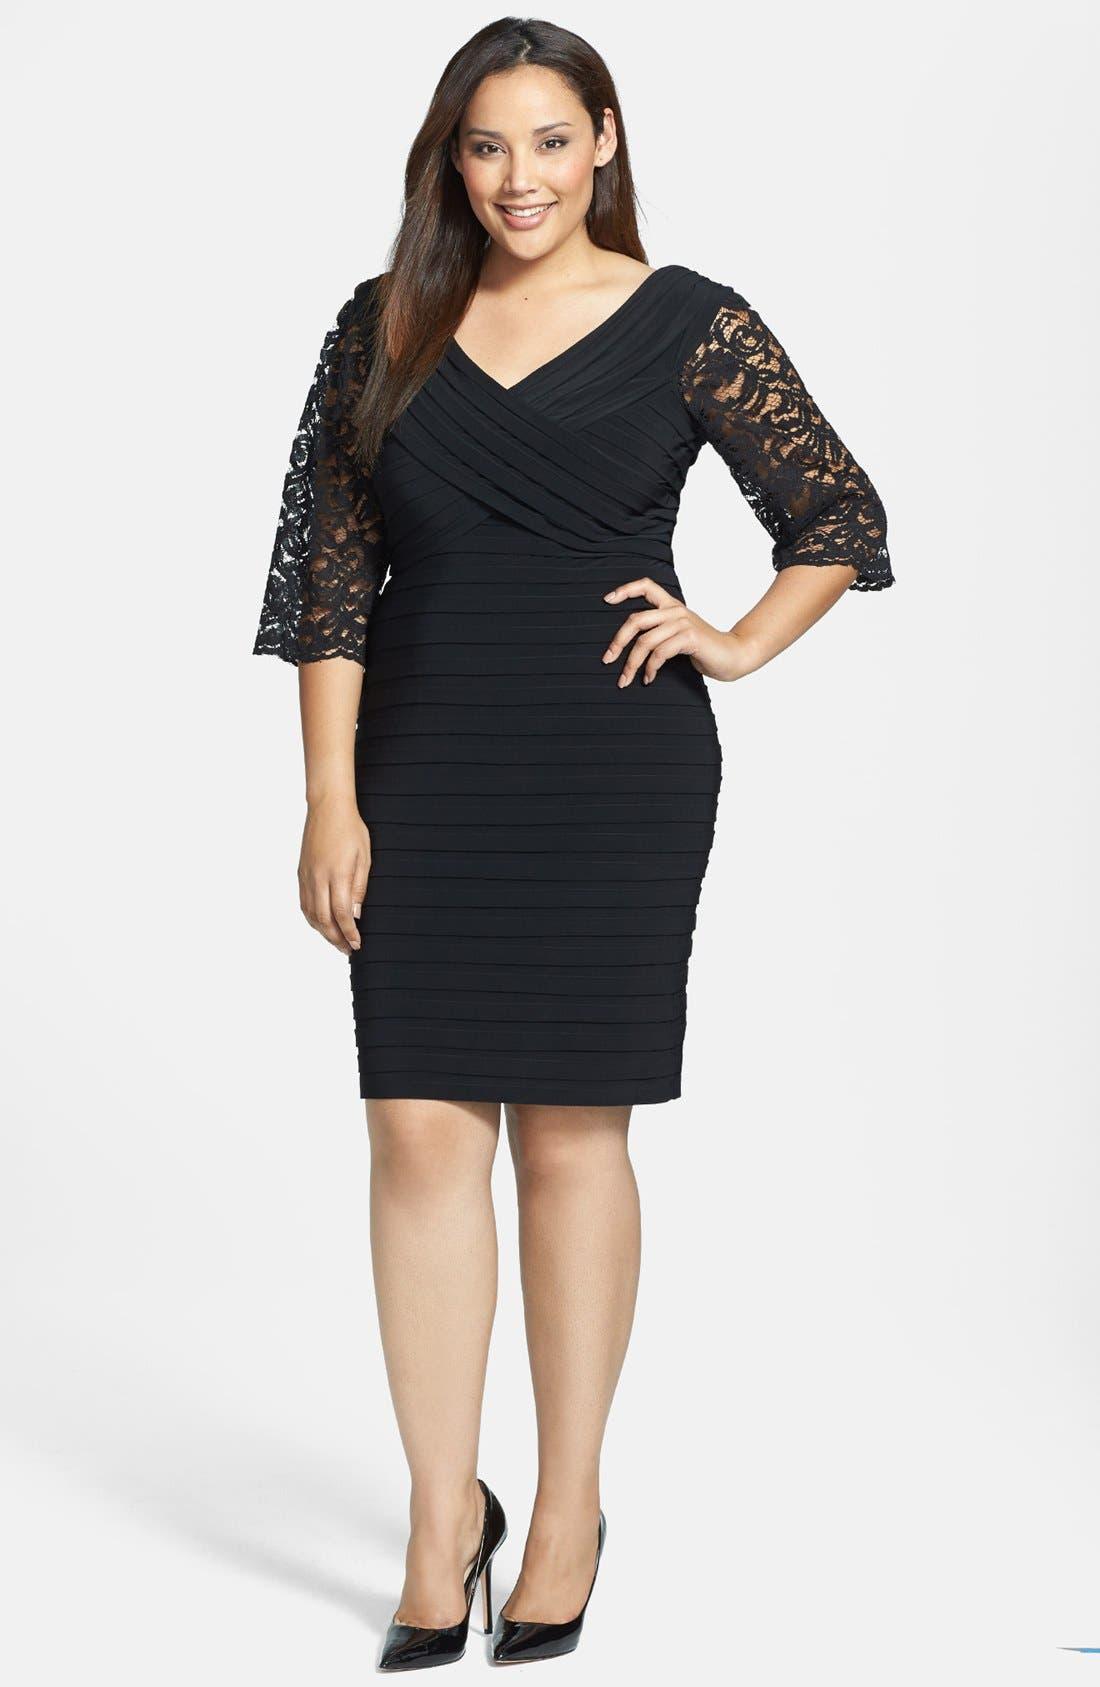 Alternate Image 1 Selected - Xscape Lace Sleeve Shutter Pleat Sheath Dress (Plus Size)